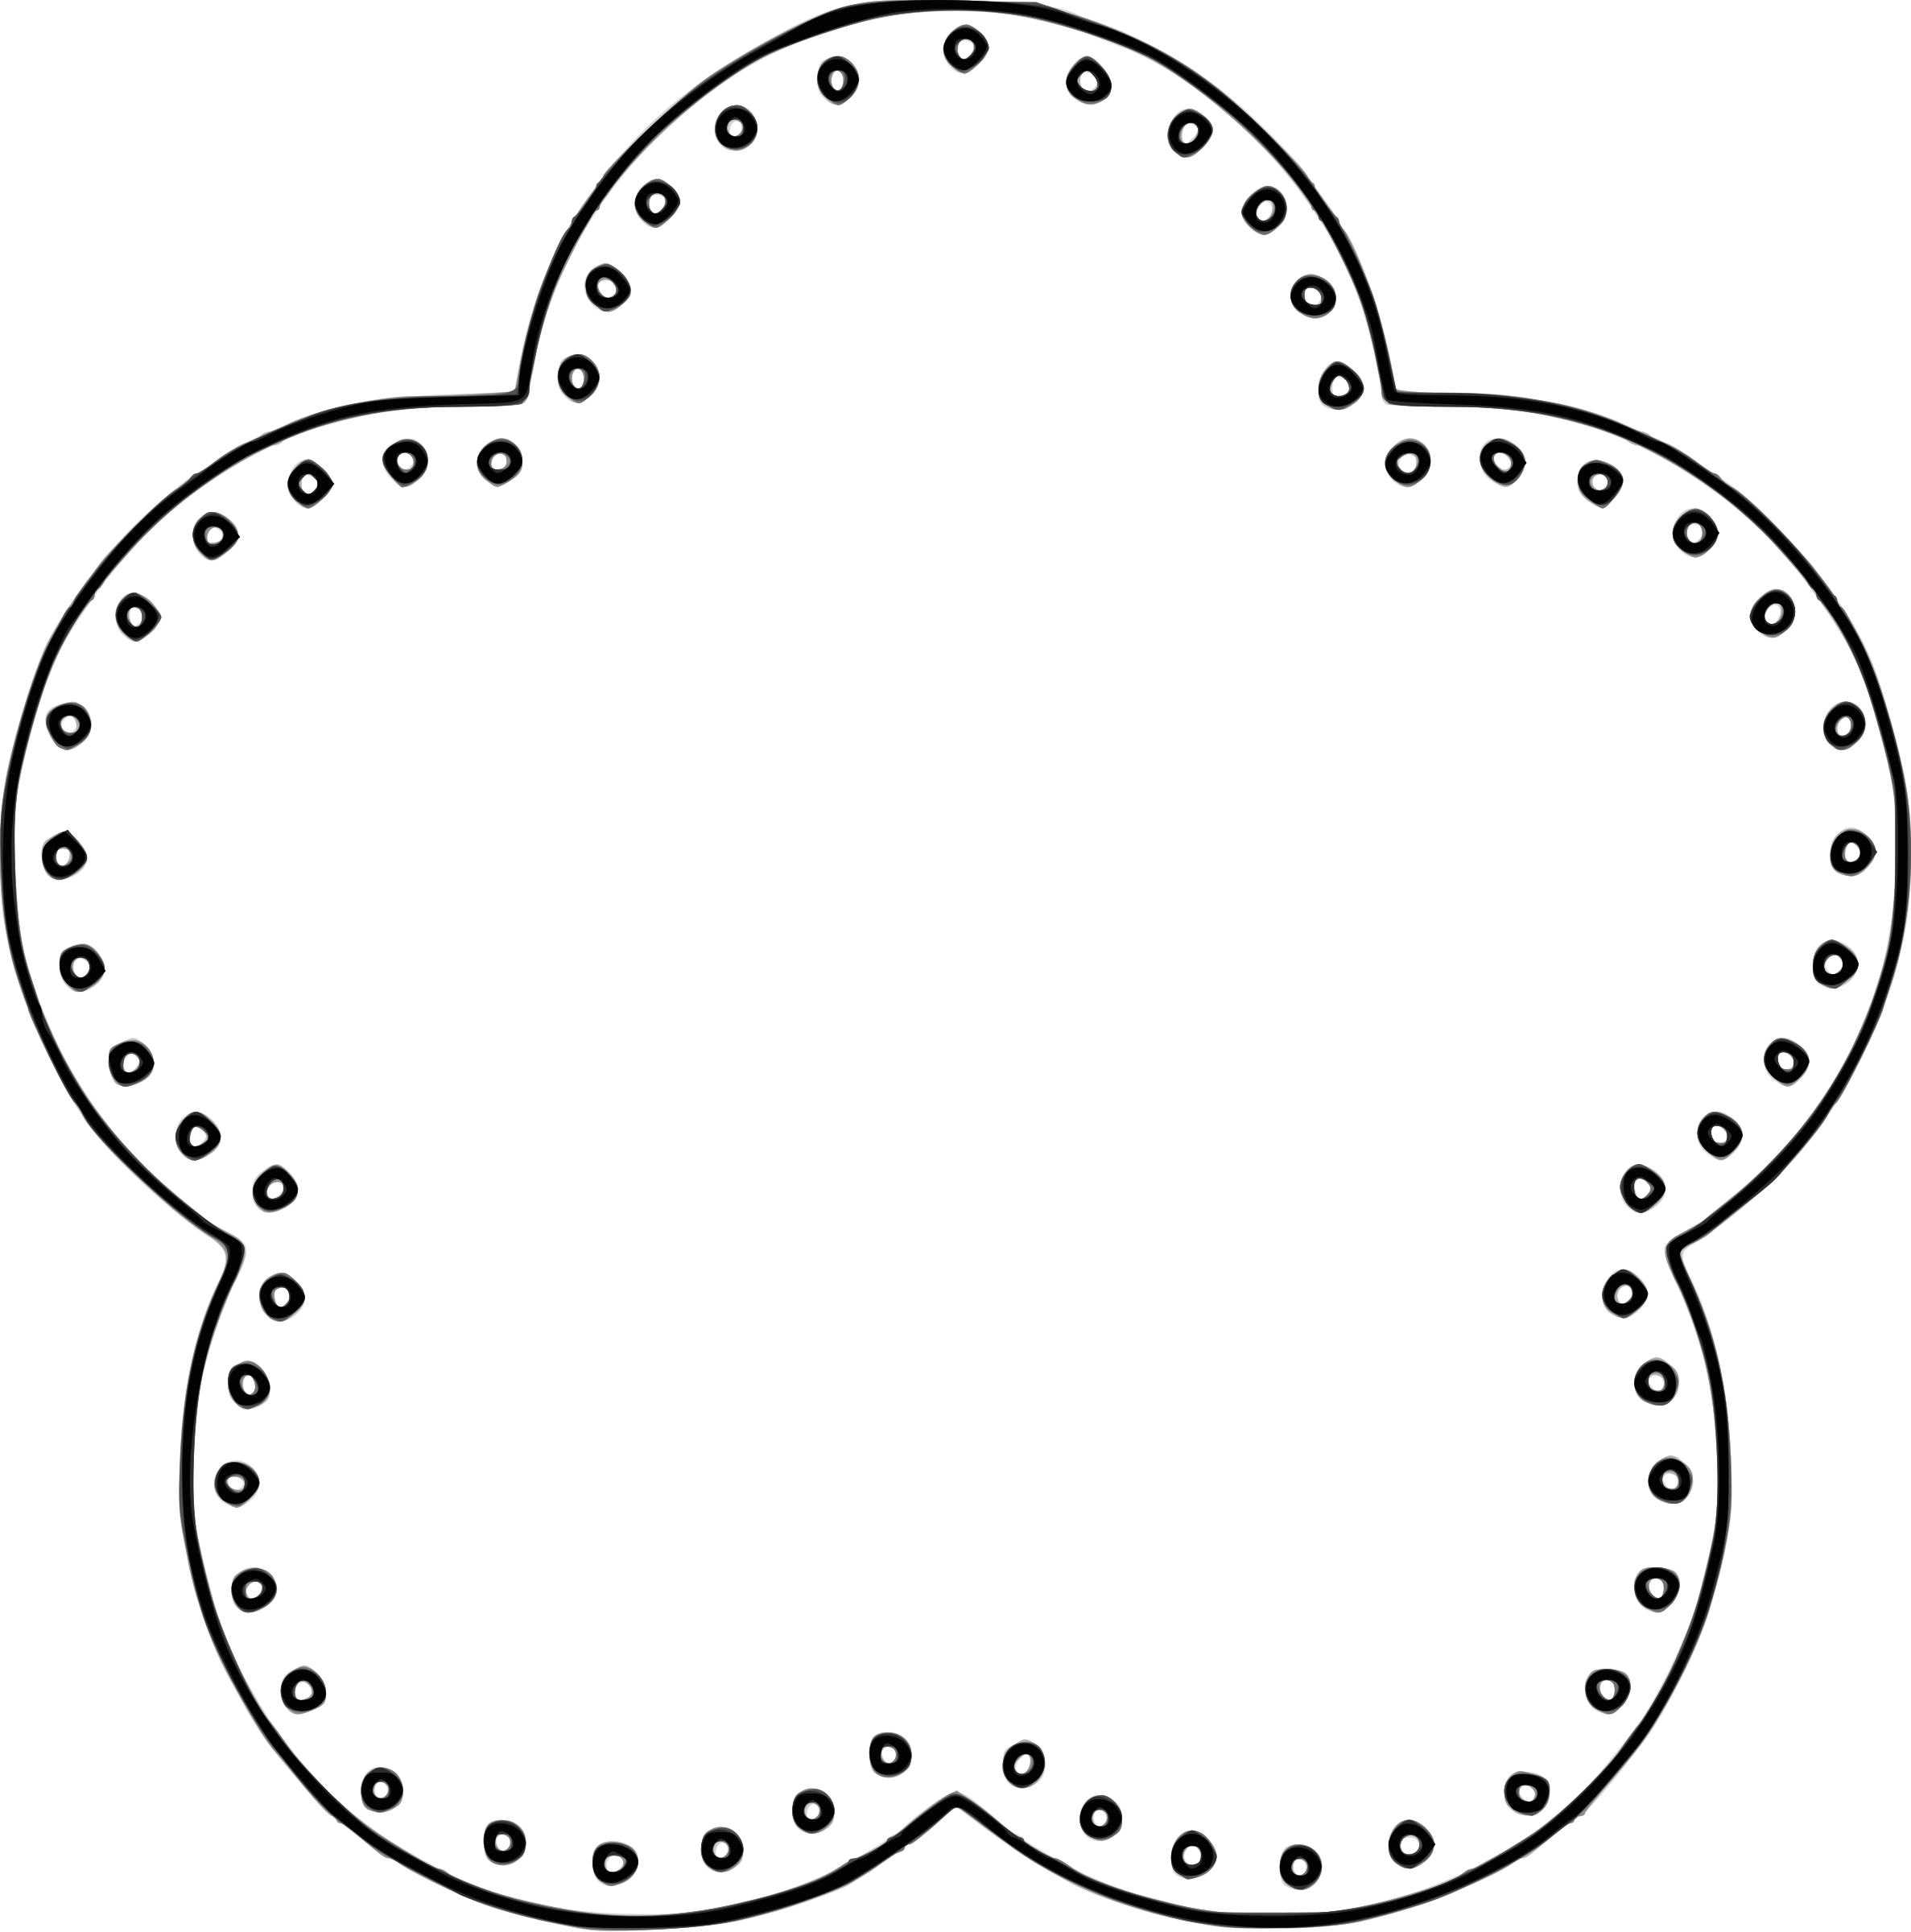 2374x2400 Circle Clipart Image 2